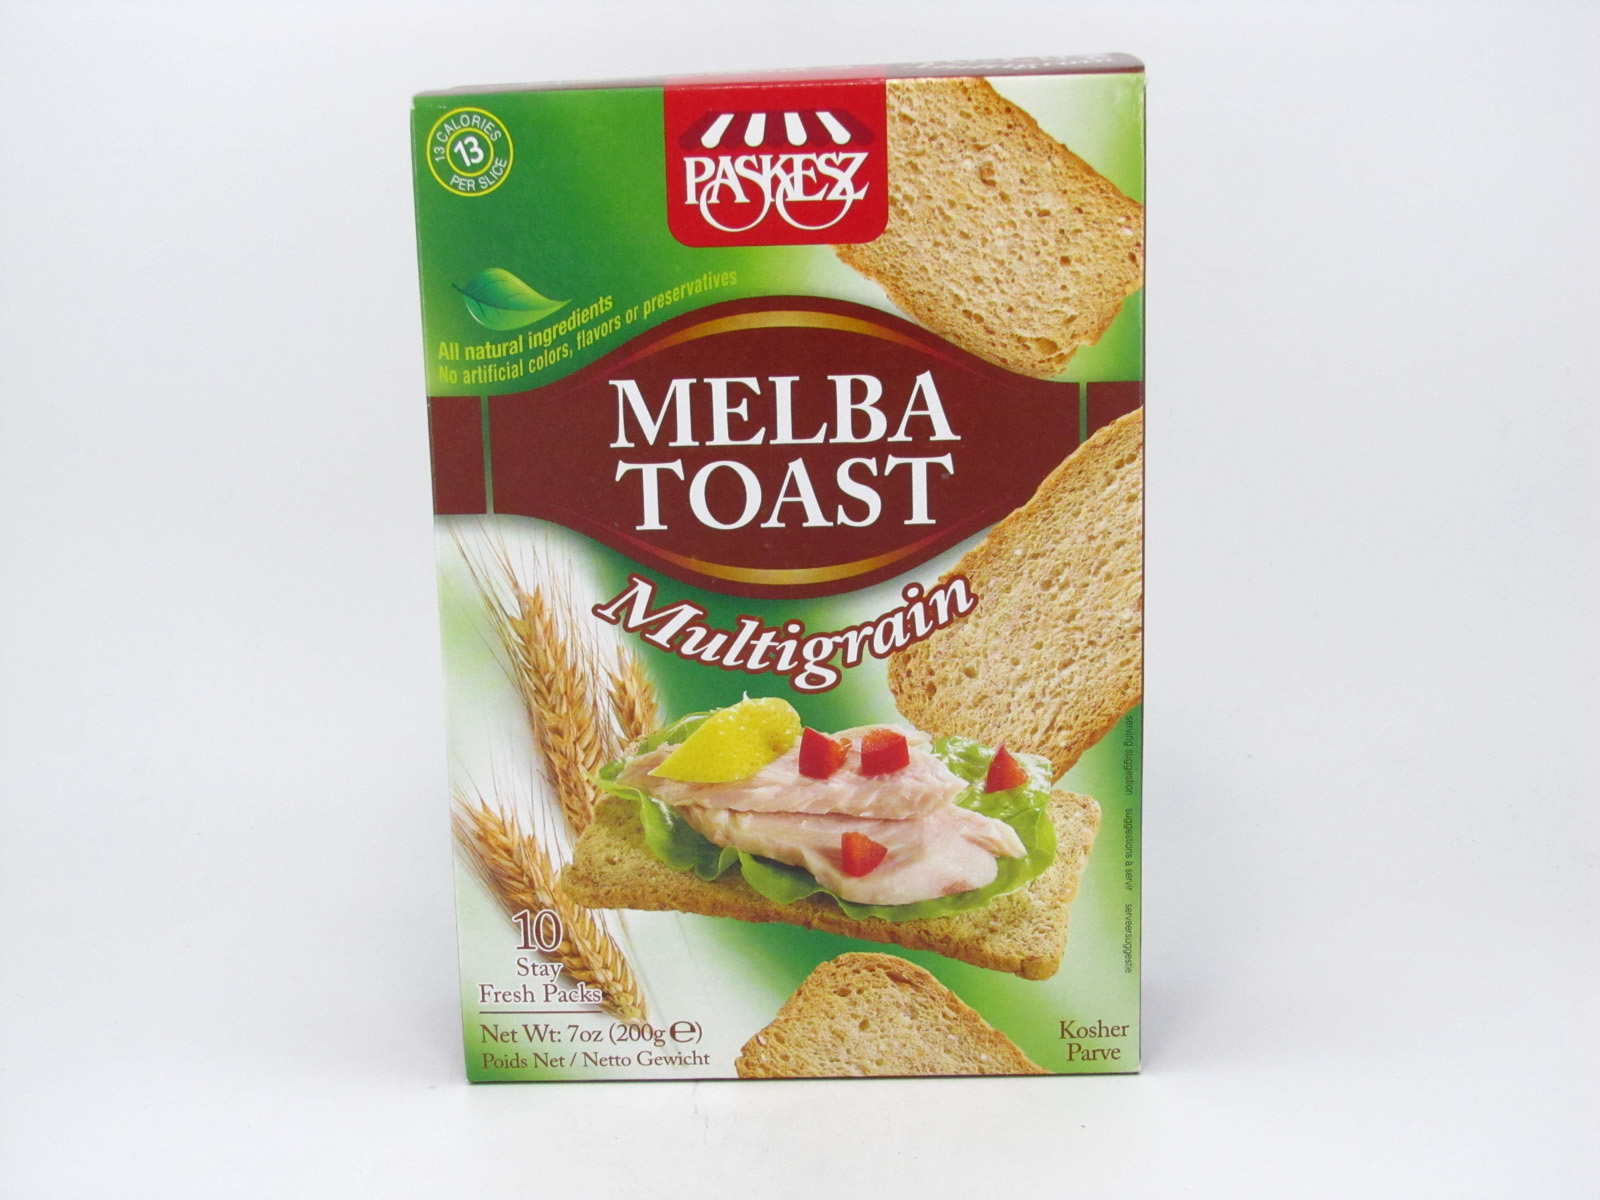 Melba Toast - Multigrain - front view